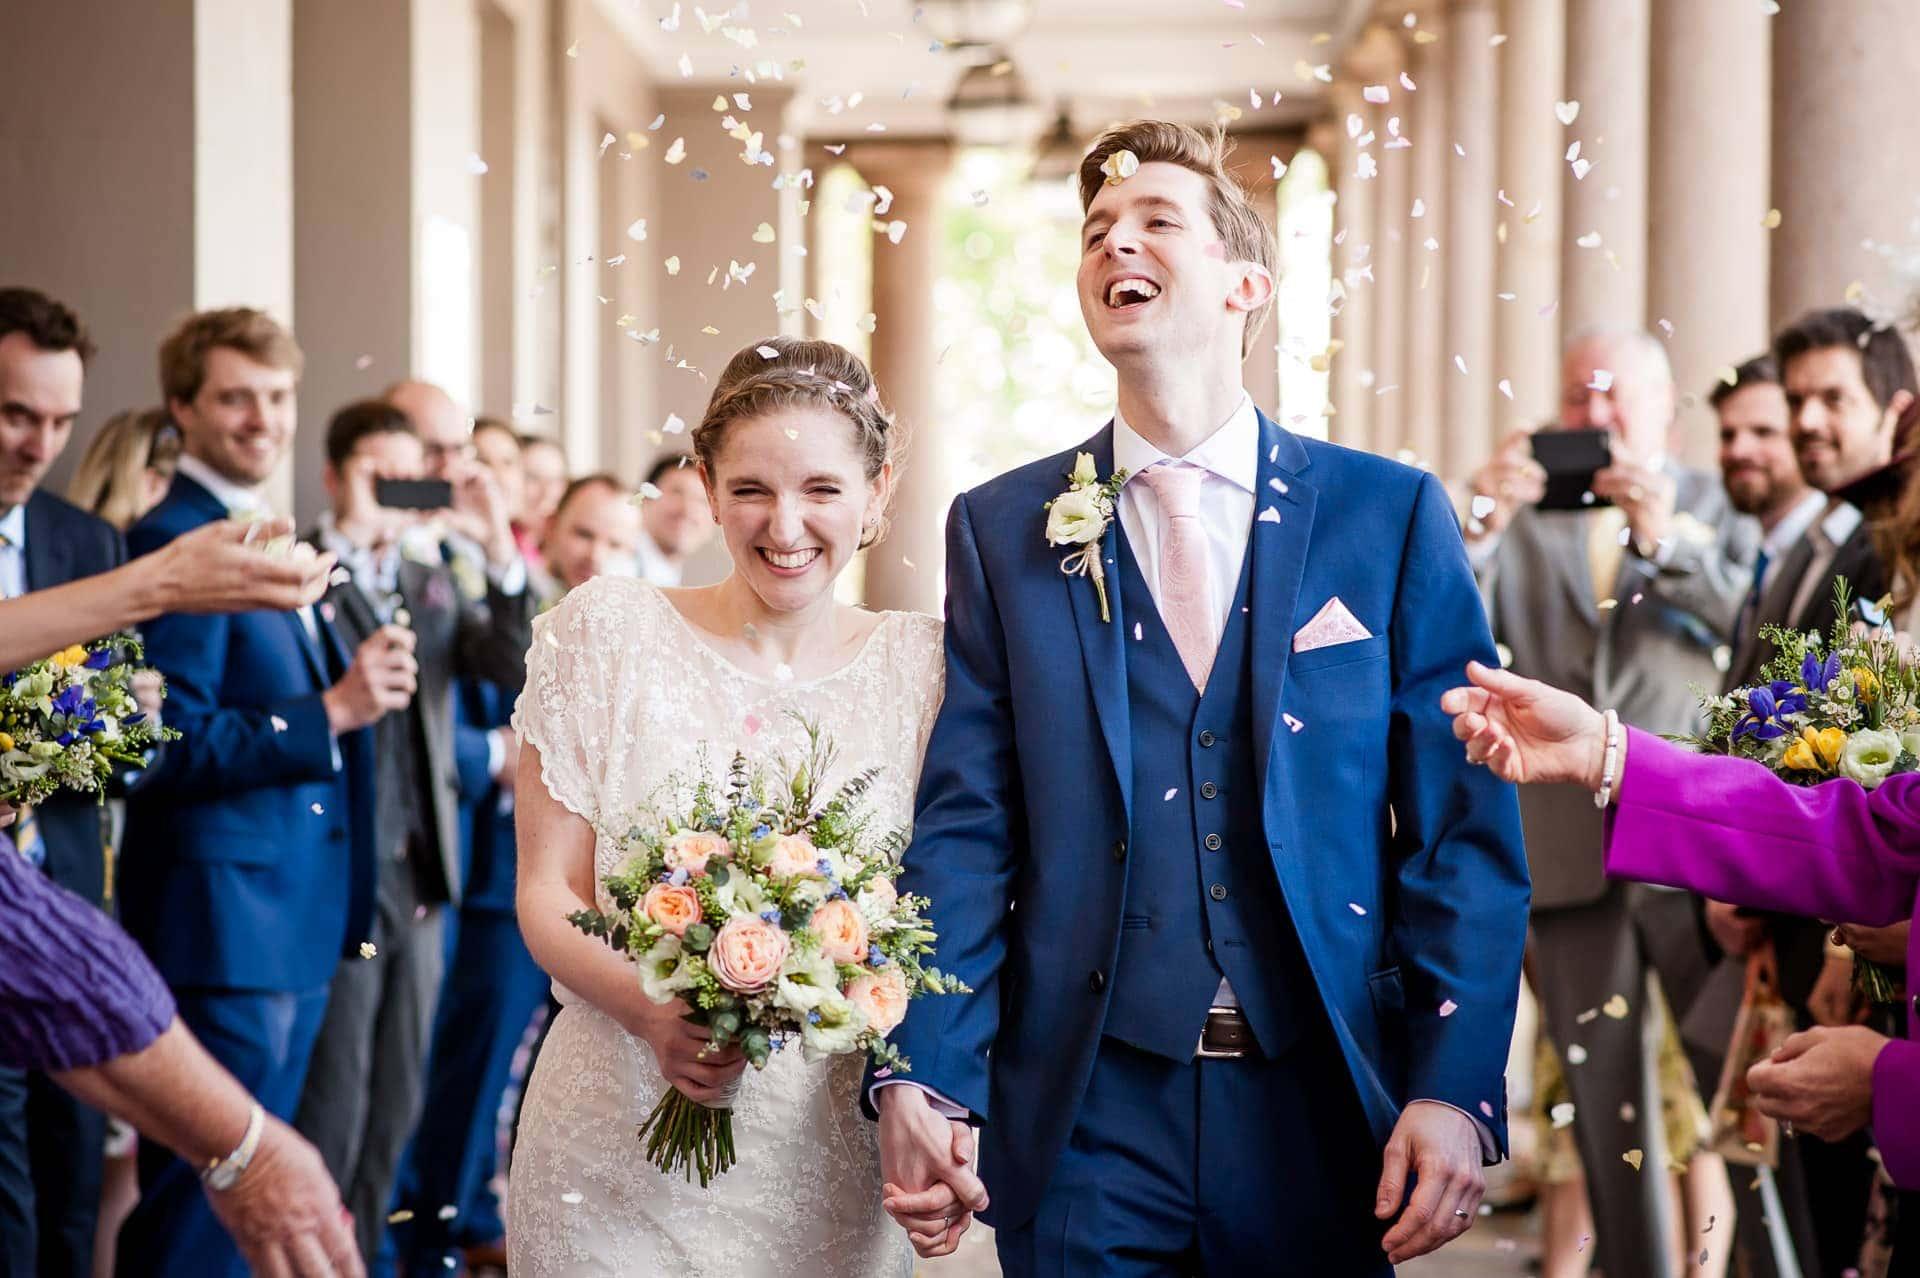 Wedding Confetti Photos